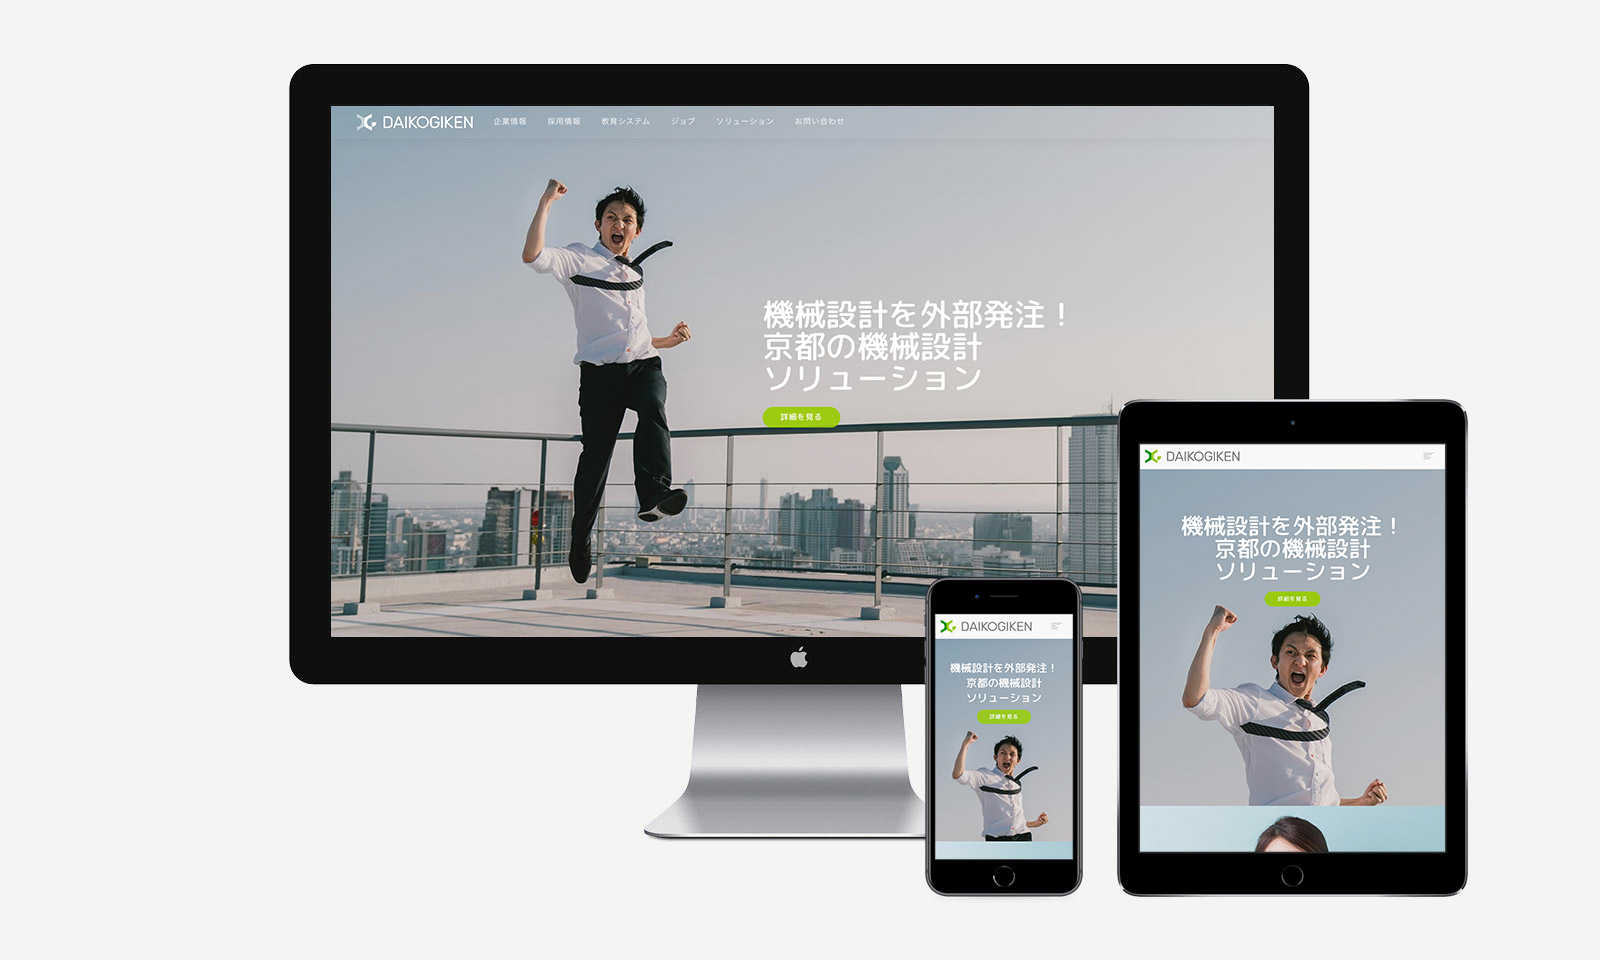 daikogiken website responsive design